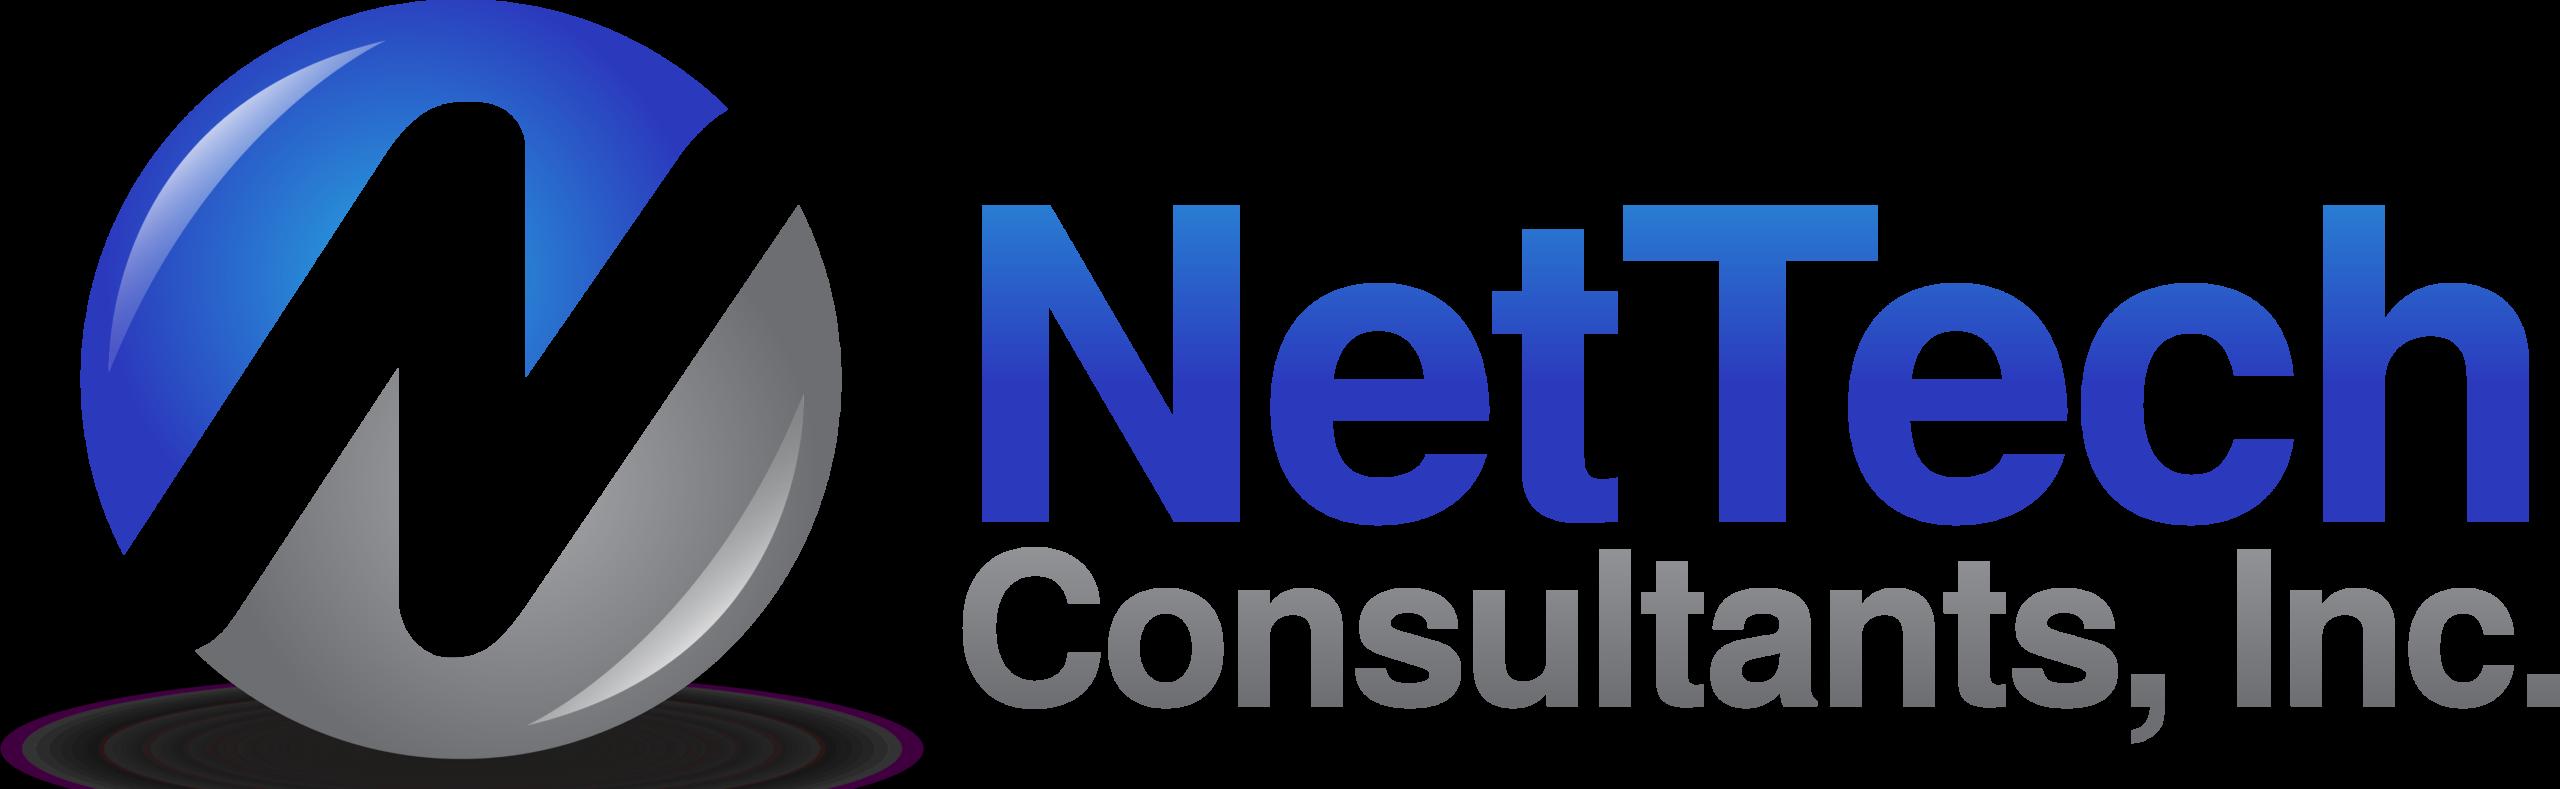 NetTech Consultants, Inc